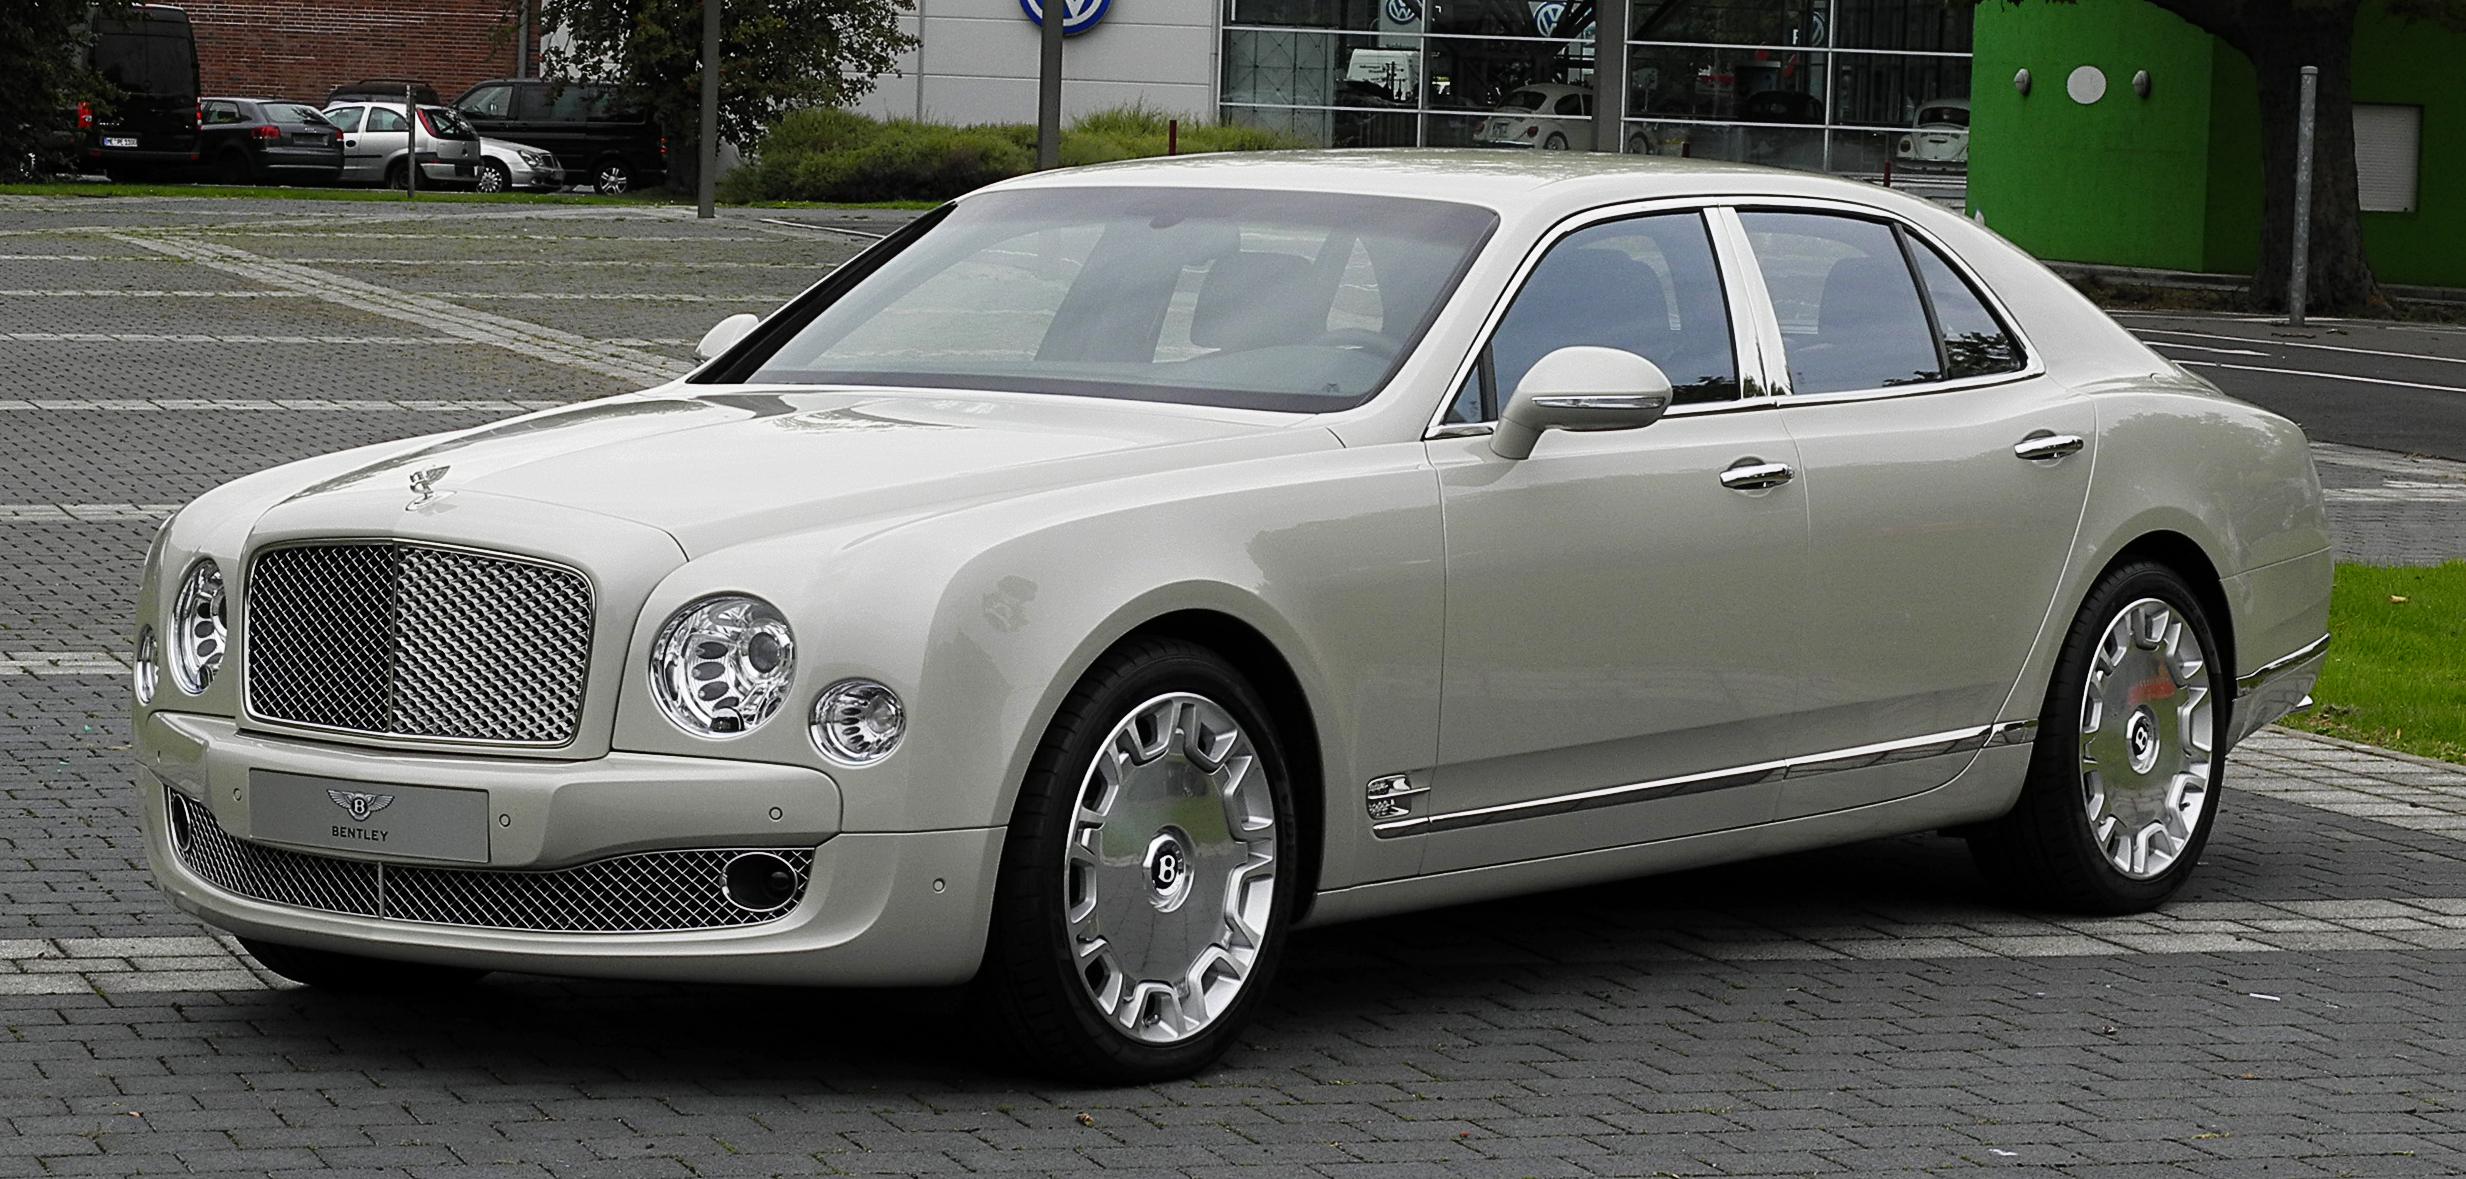 Bentley Mulsanne (2010) - Wikipedia